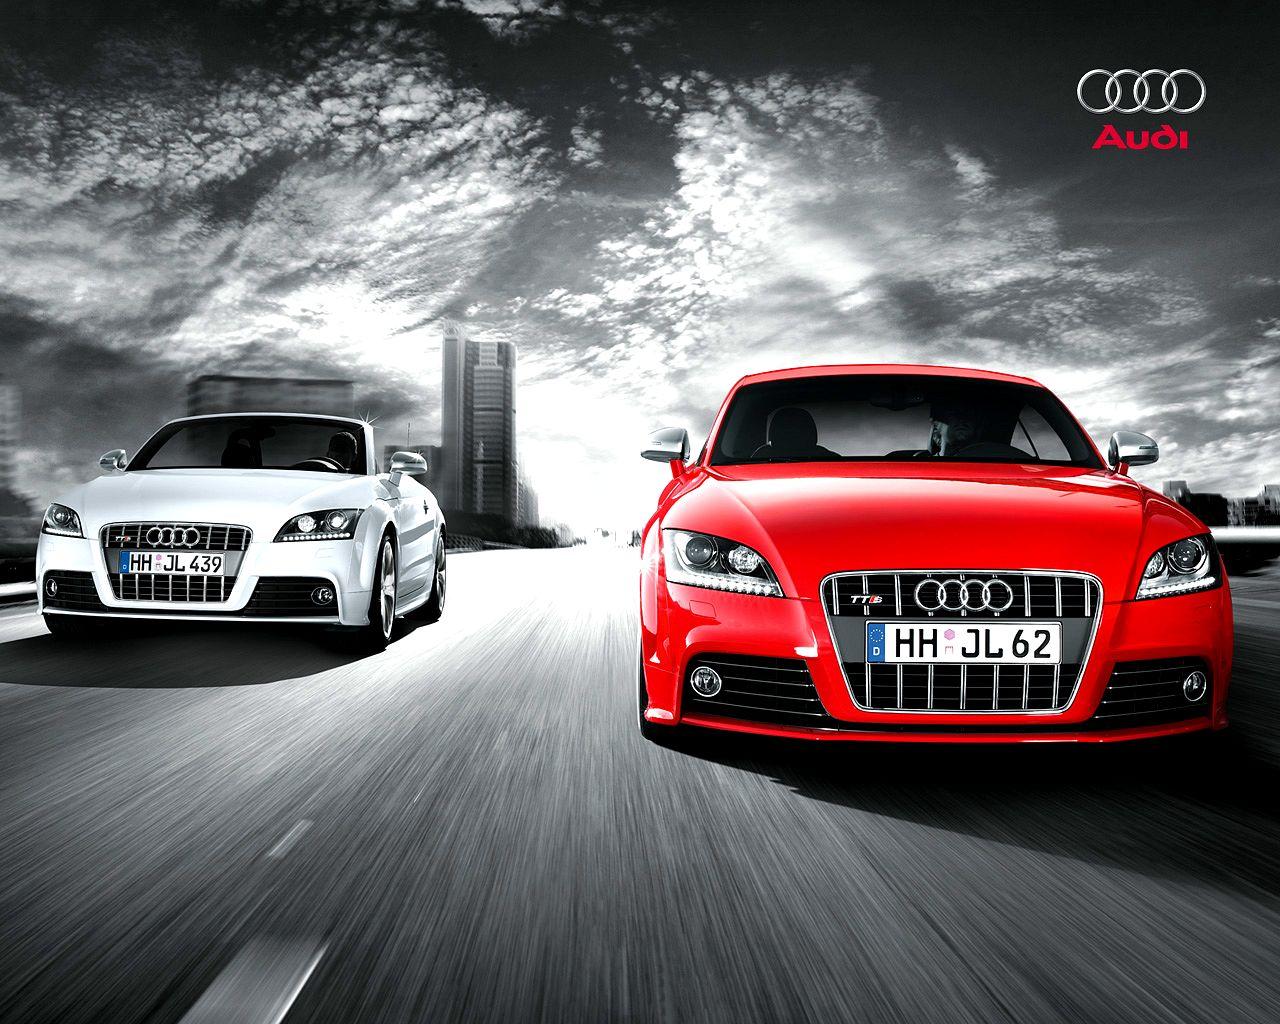 Amazing Audi Car HD Wallpaper   Amazing Photos   Amazing 1280x1024